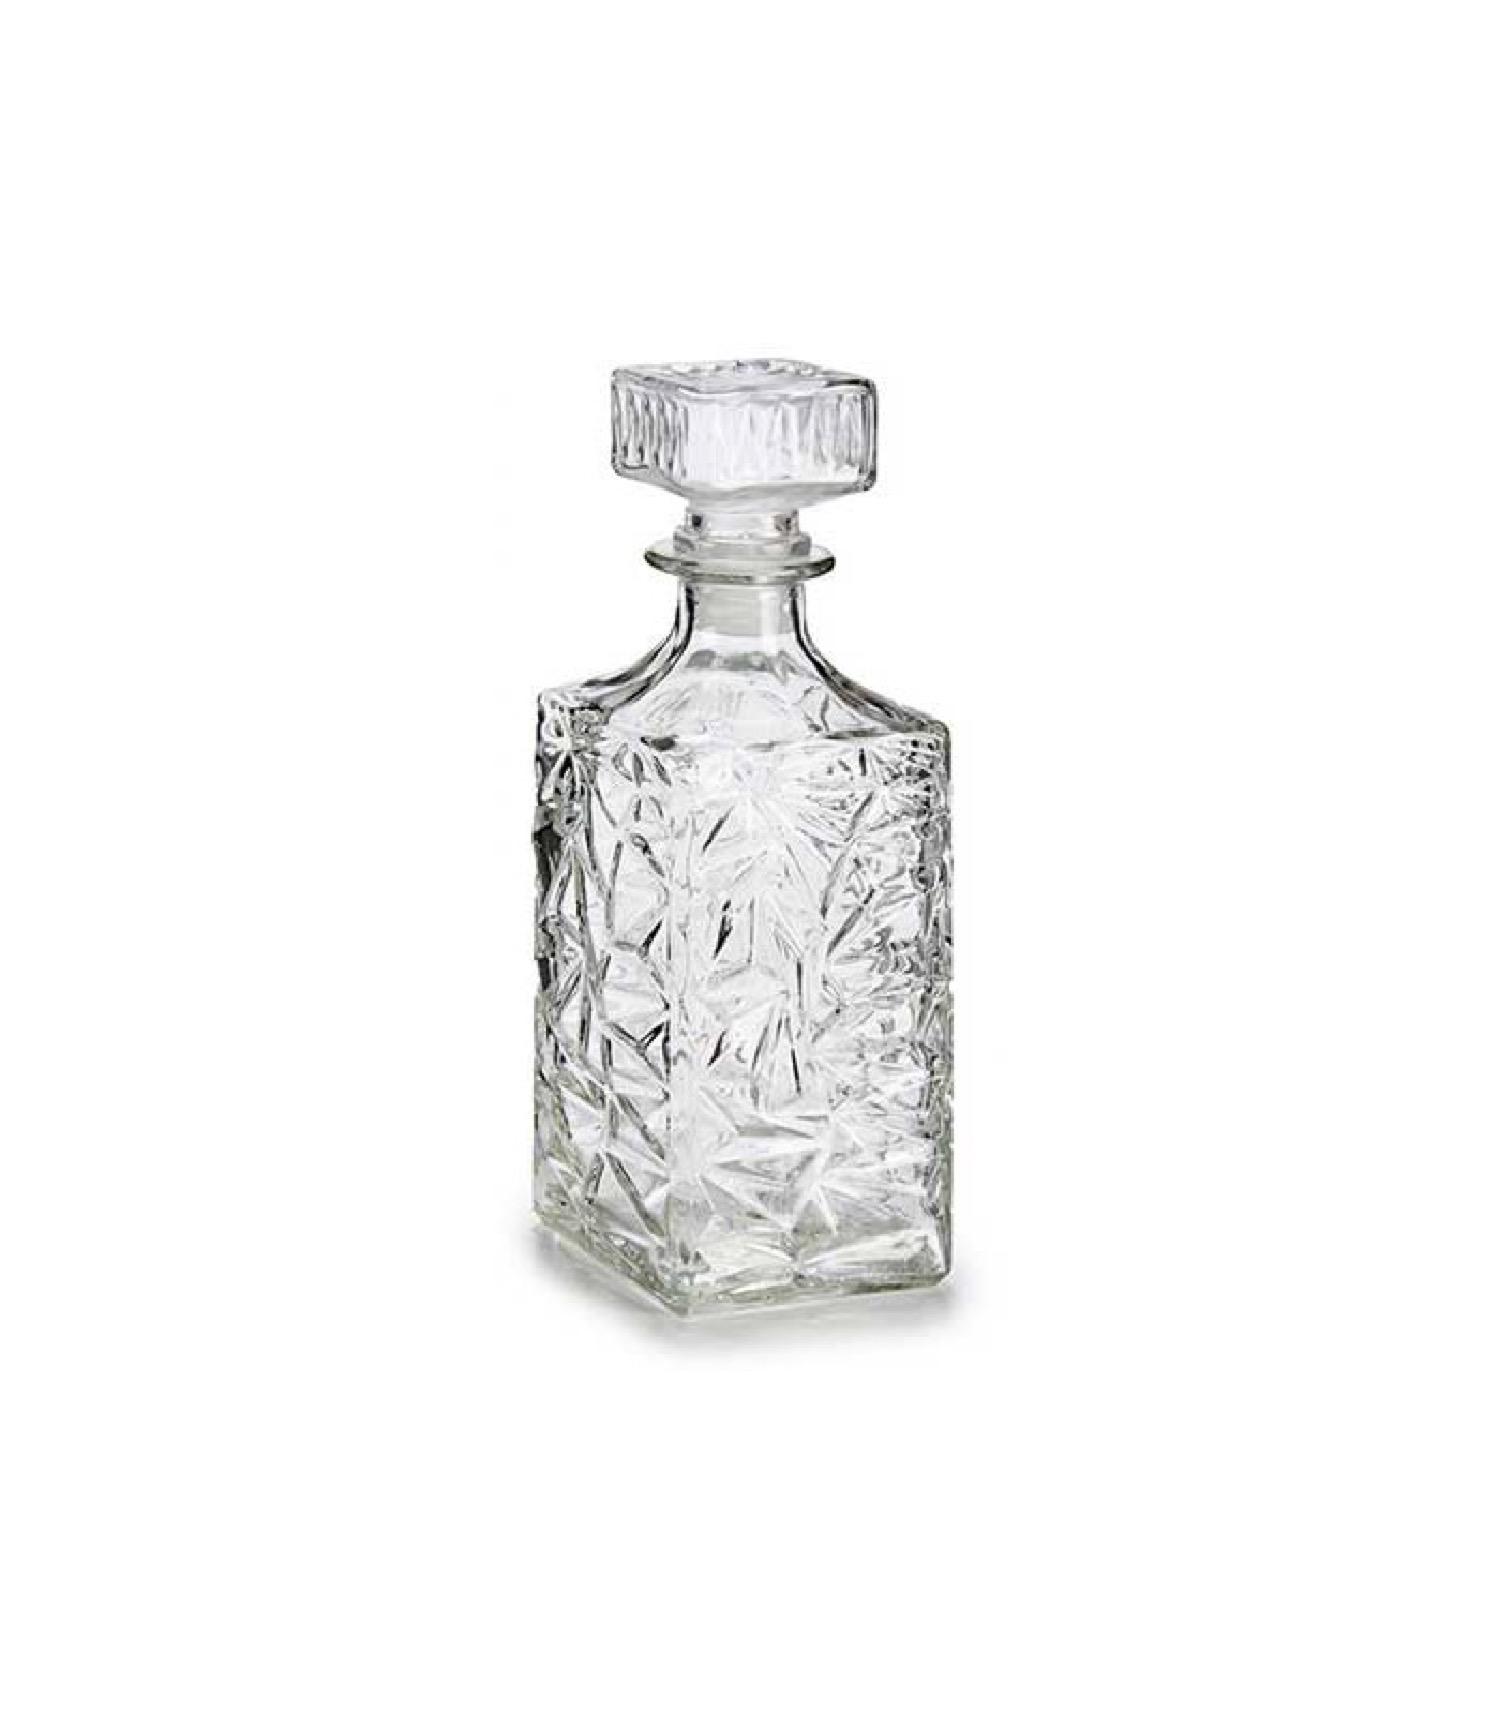 Carafe à whisky en verre taillé transparent 1L